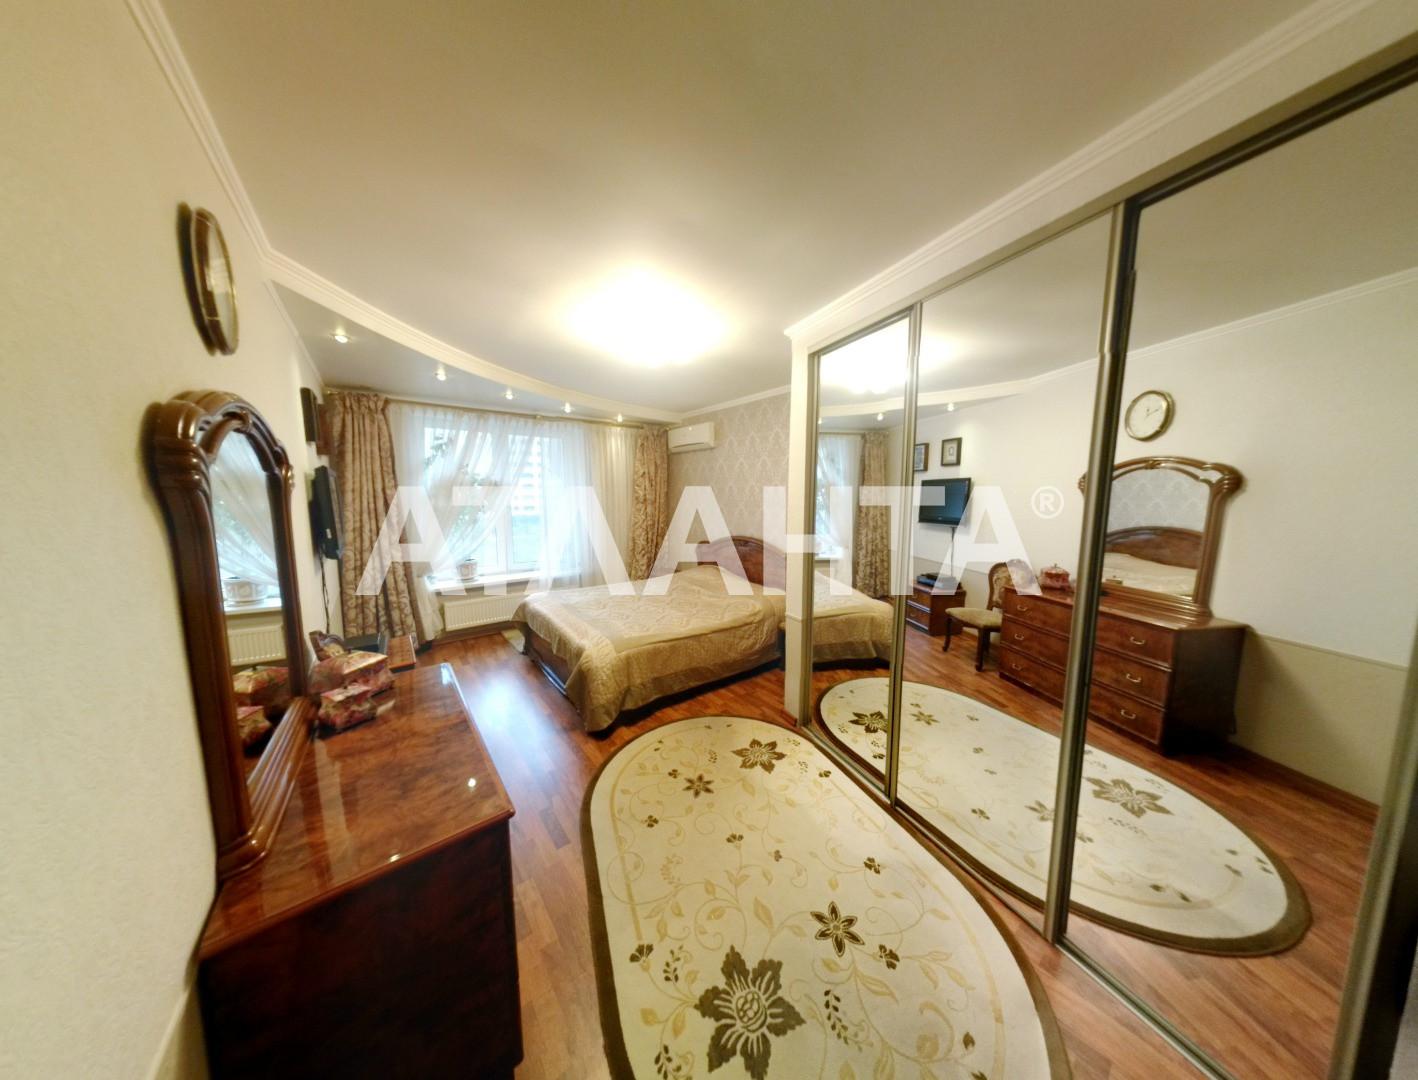 Продается 3-комнатная Квартира на ул. Ул. Ломоносова — 139 600 у.е. (фото №17)